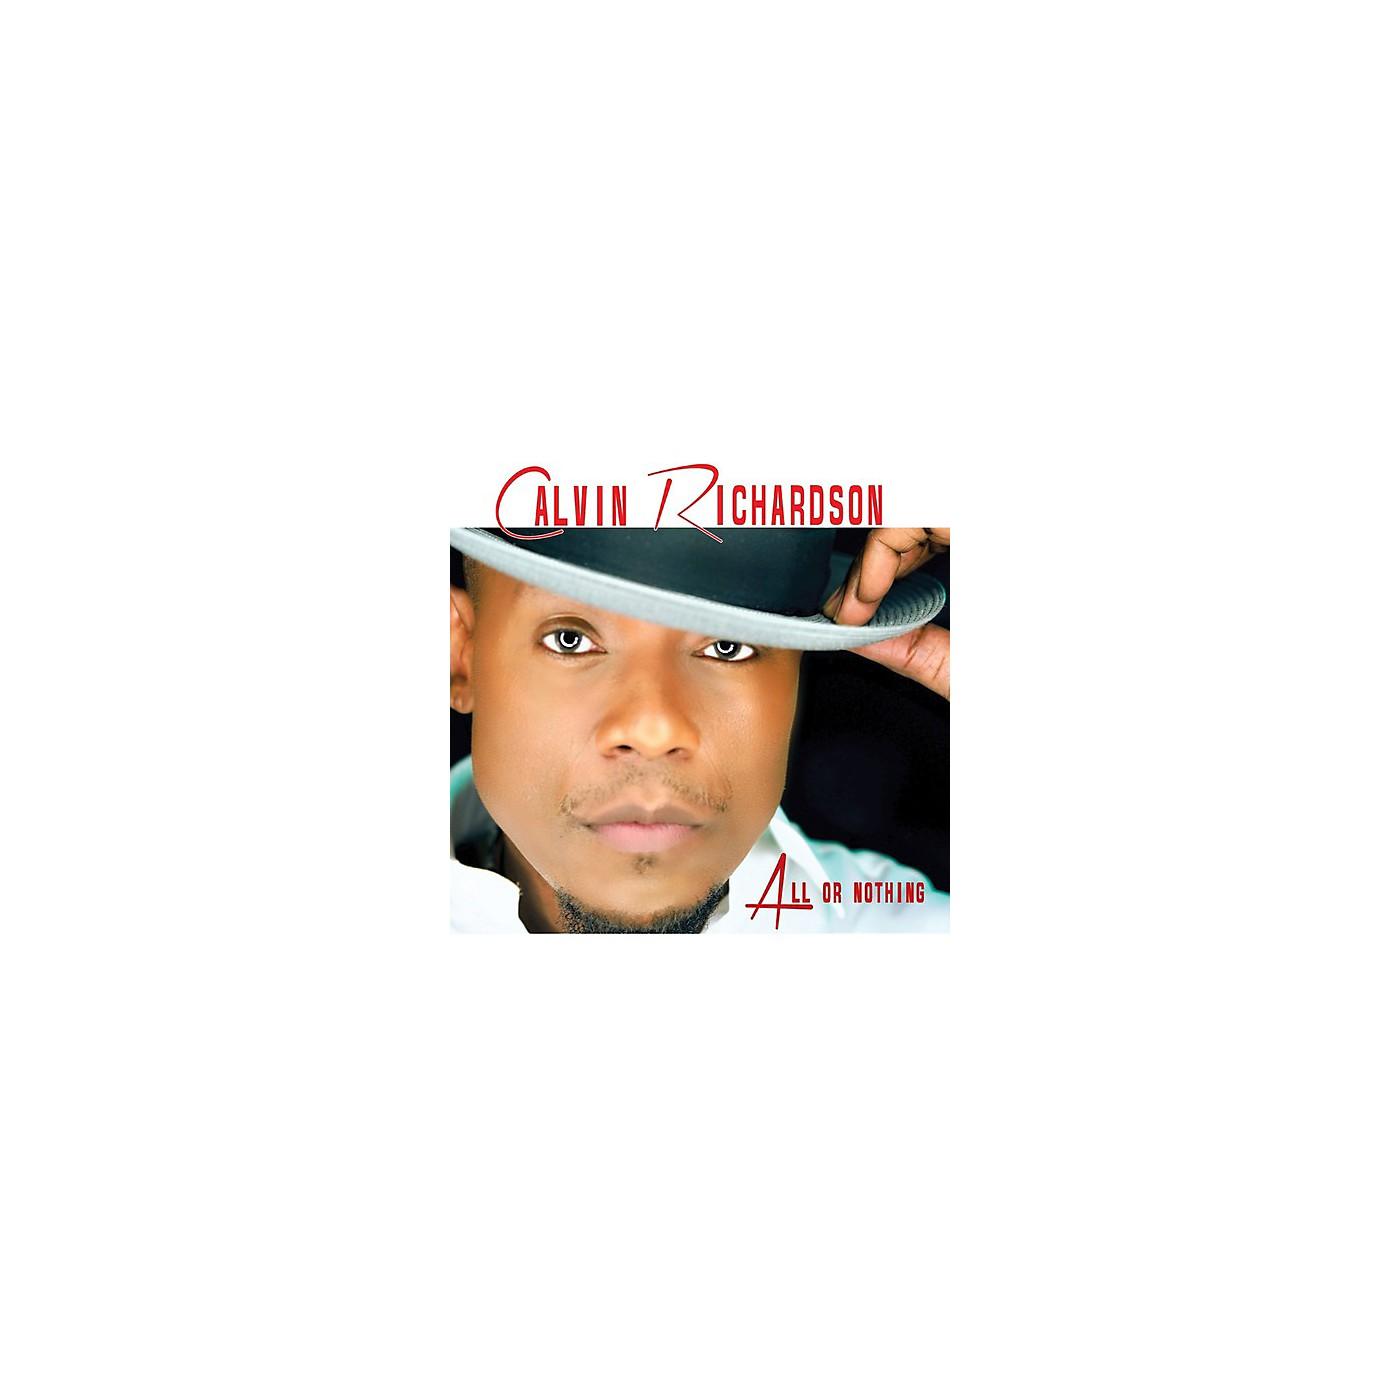 Alliance Calvin Richardson - All Or Nothing (CD) thumbnail